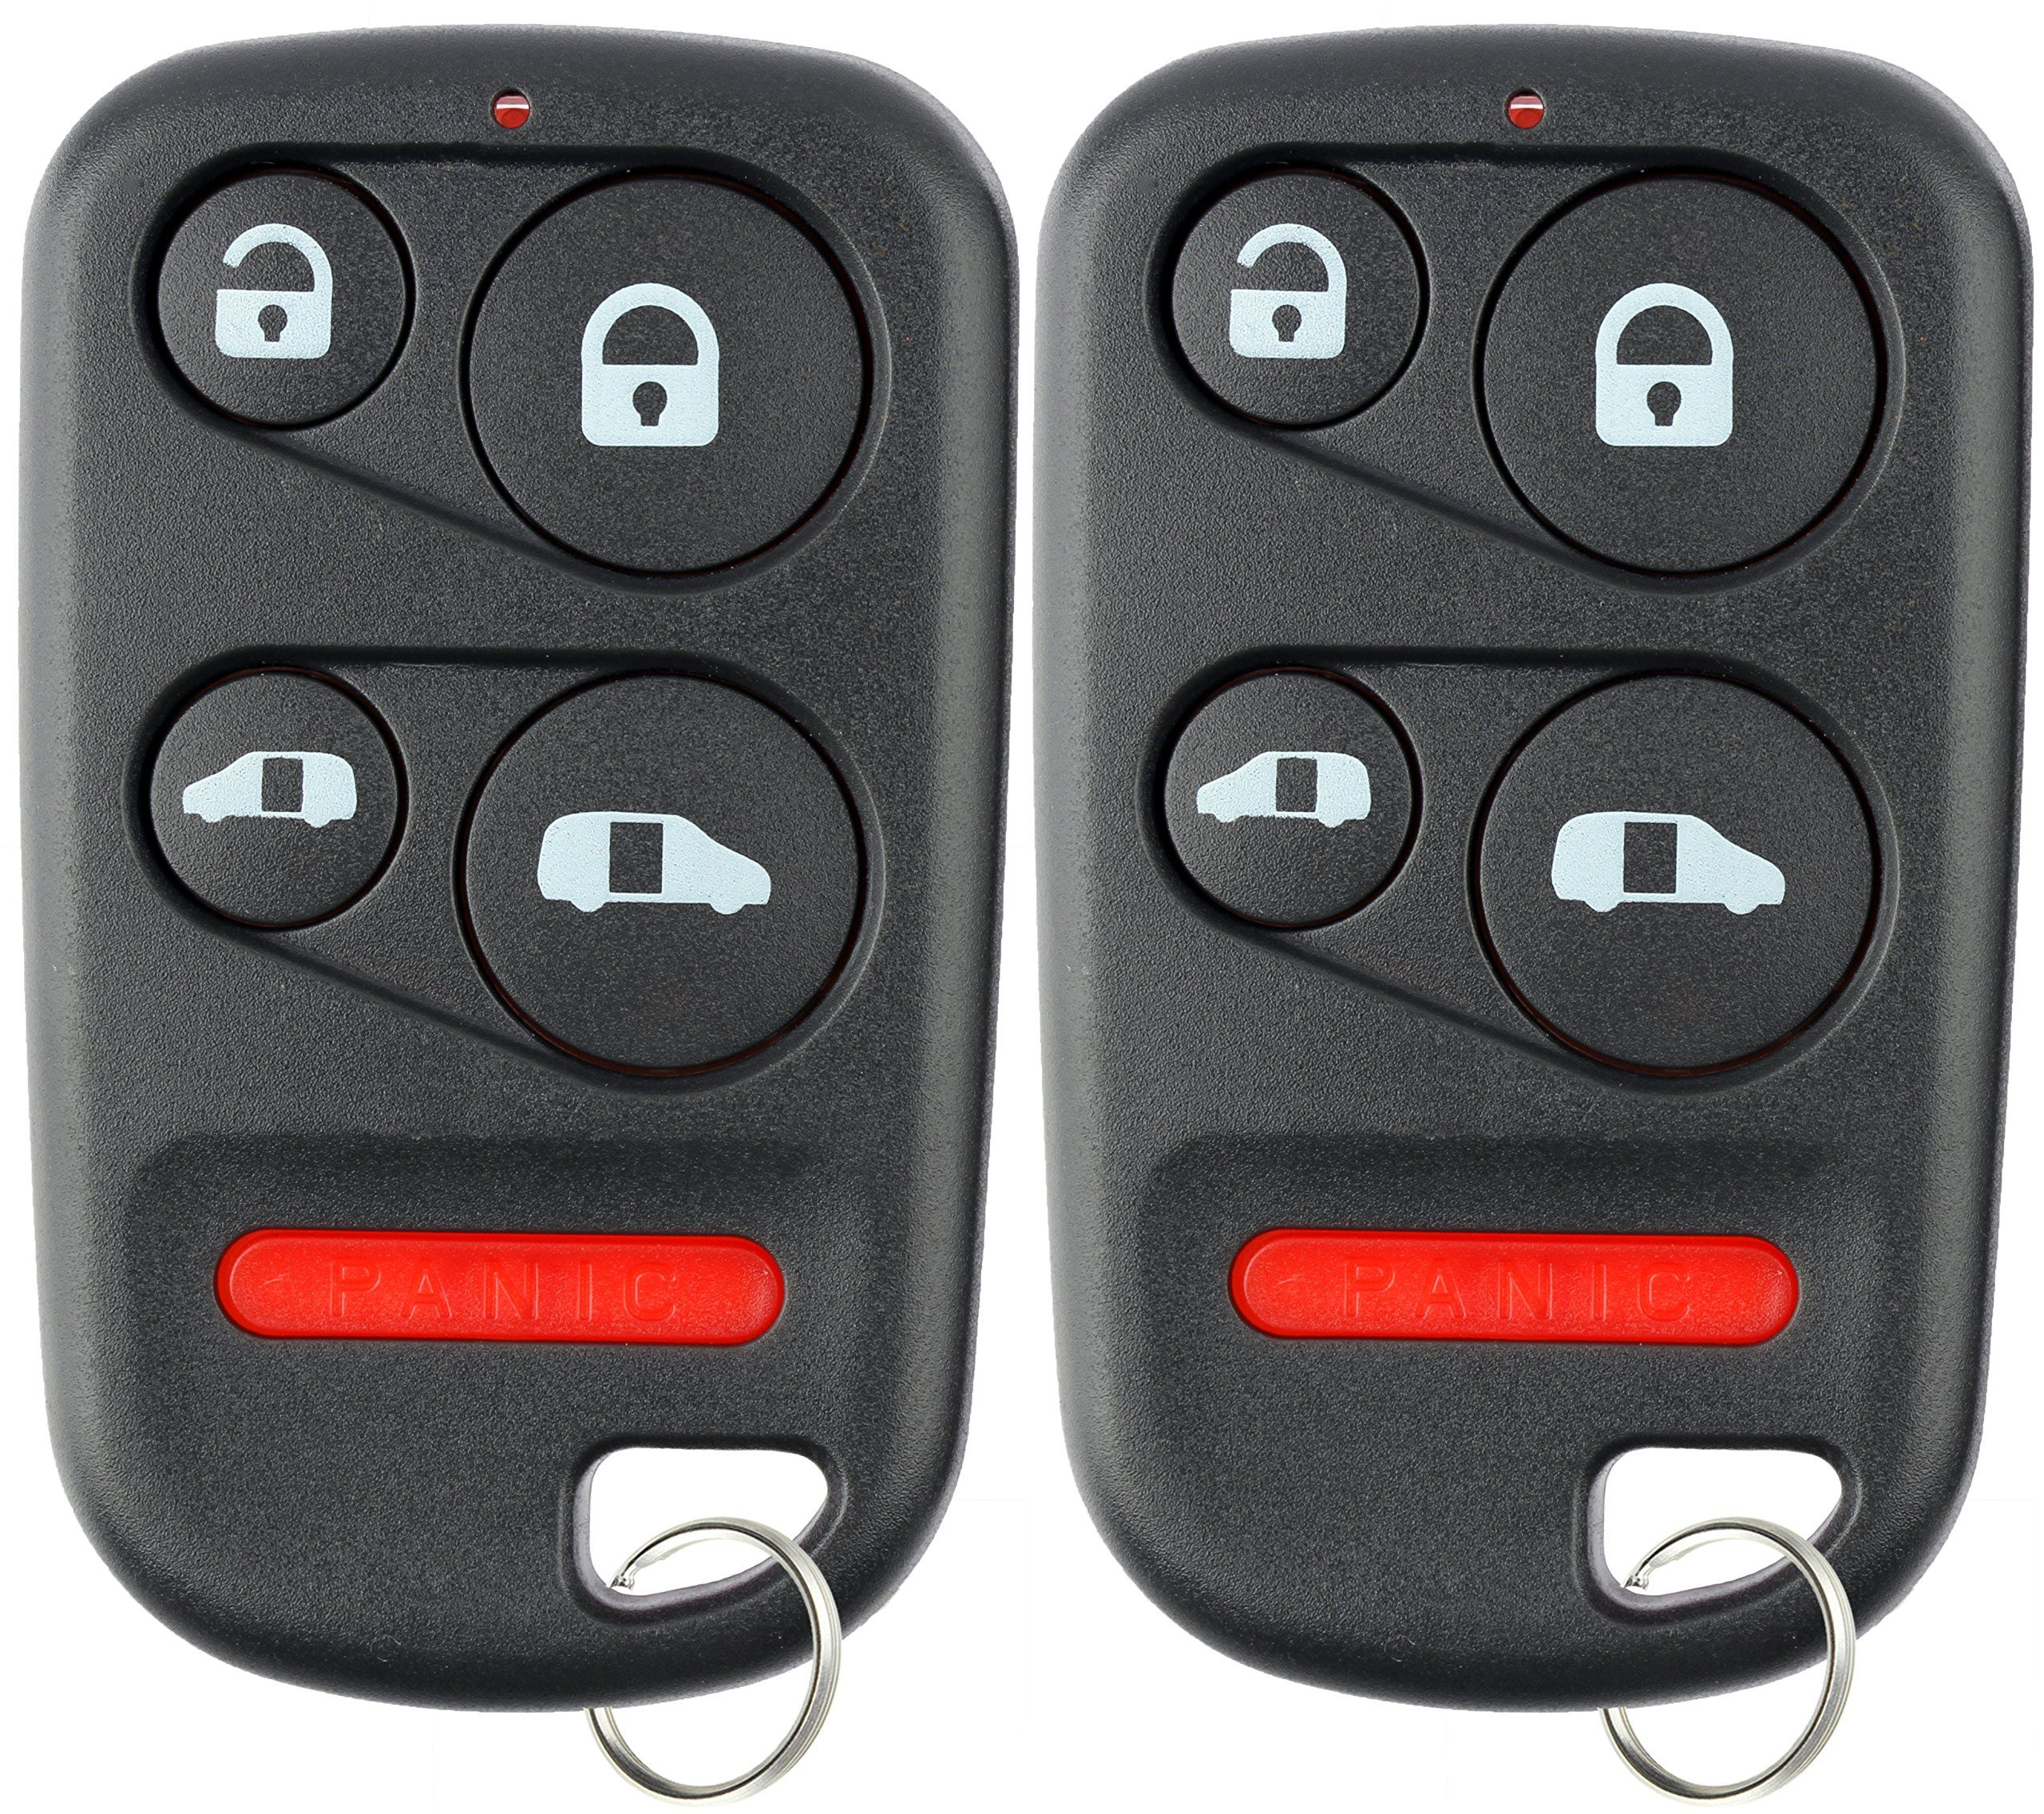 Keylessoption Keyless Entry Remote Control Car Key Fob Replacement